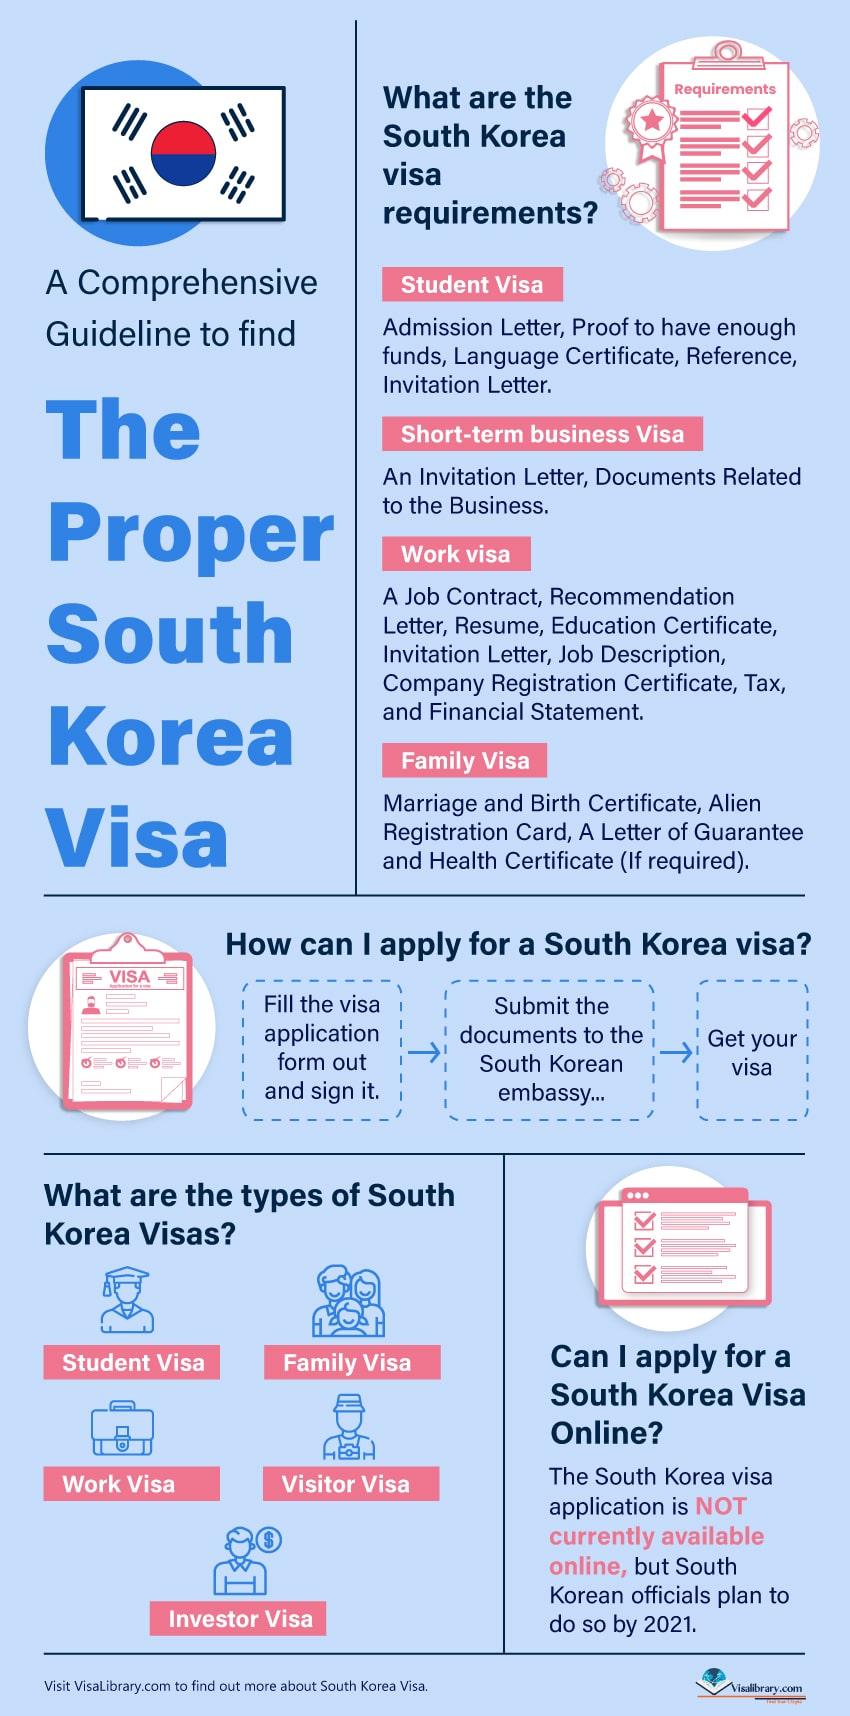 A Comprehensive Guideline to find the proper South Korea Visa info